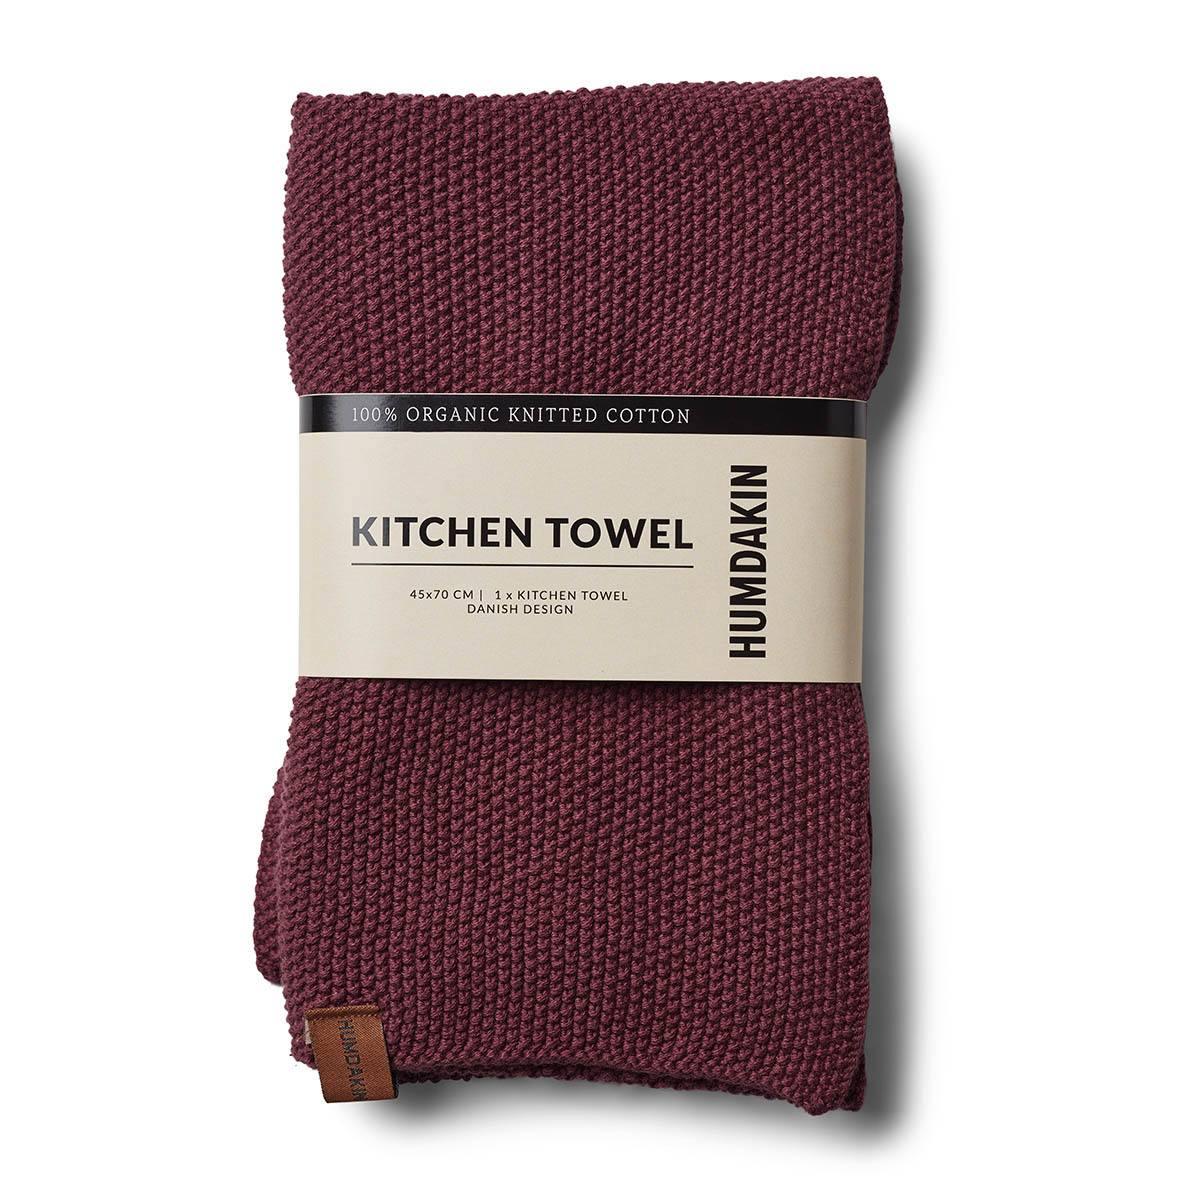 Humdakin Violet Plumb Knitted Kitchen Towel